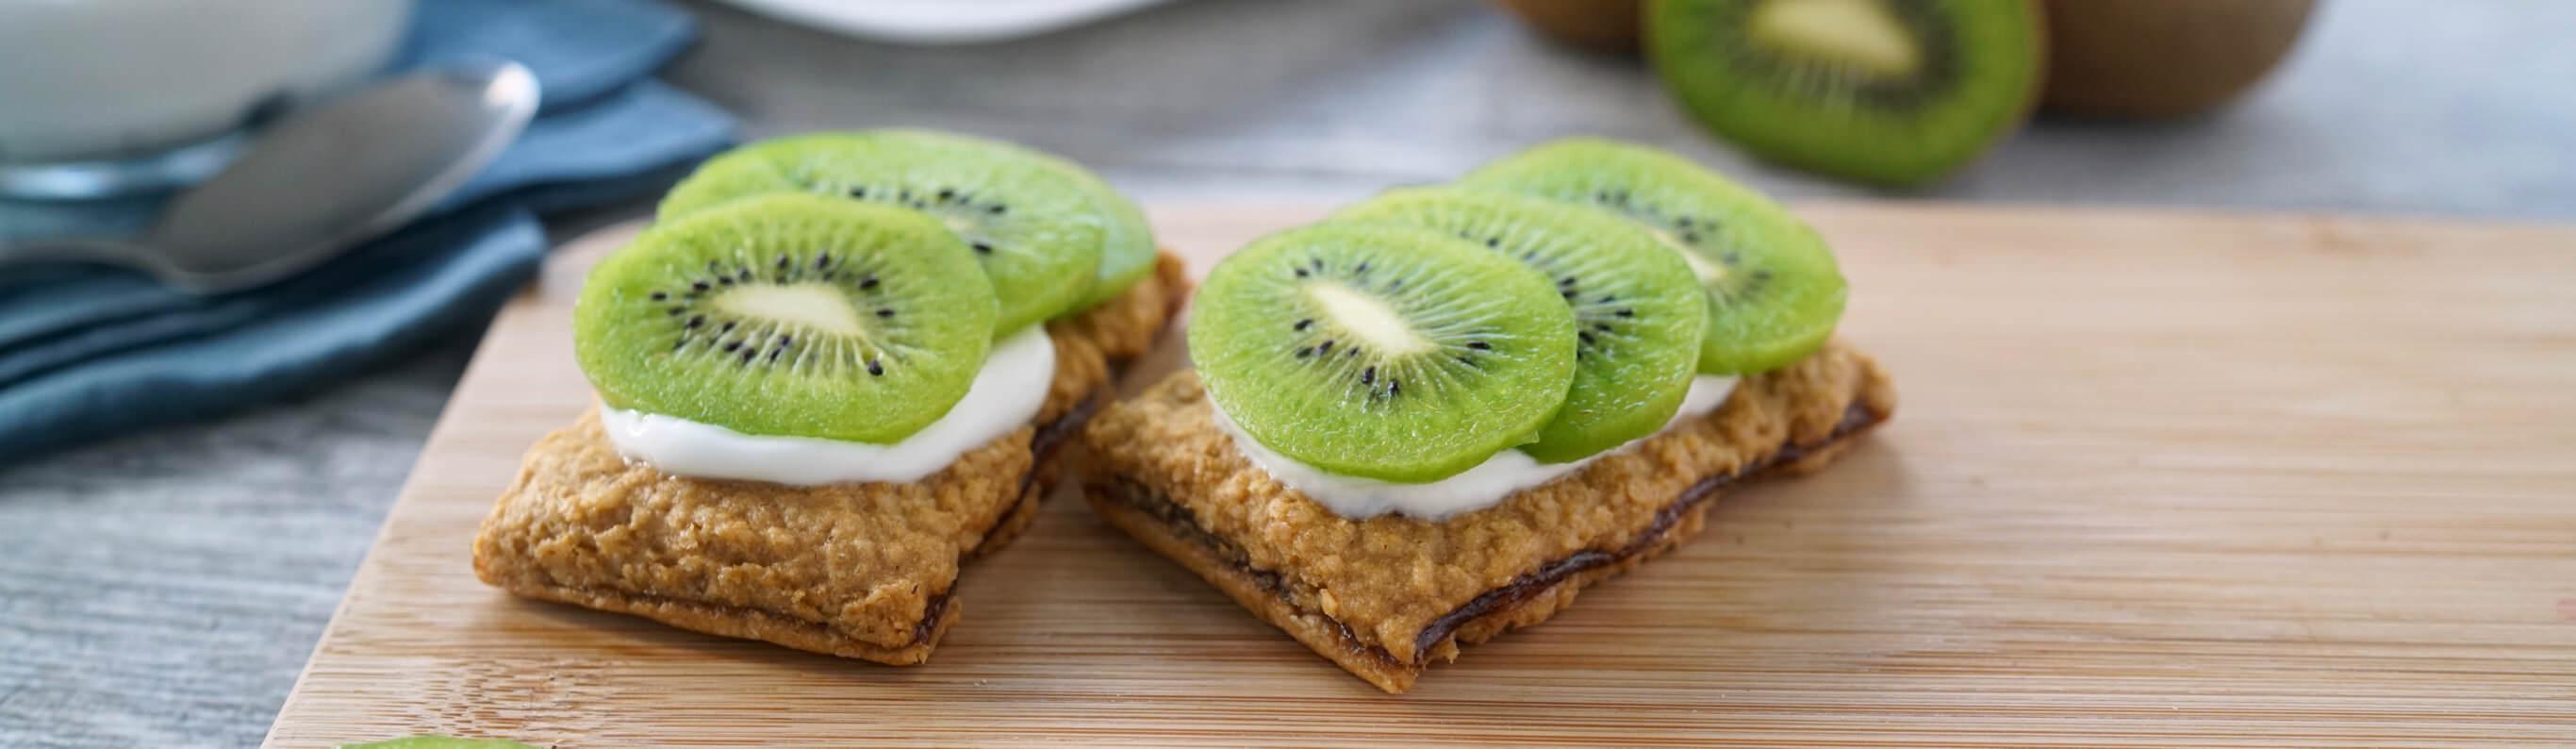 Kiwi Strawberry PBJ Sandwich Bars